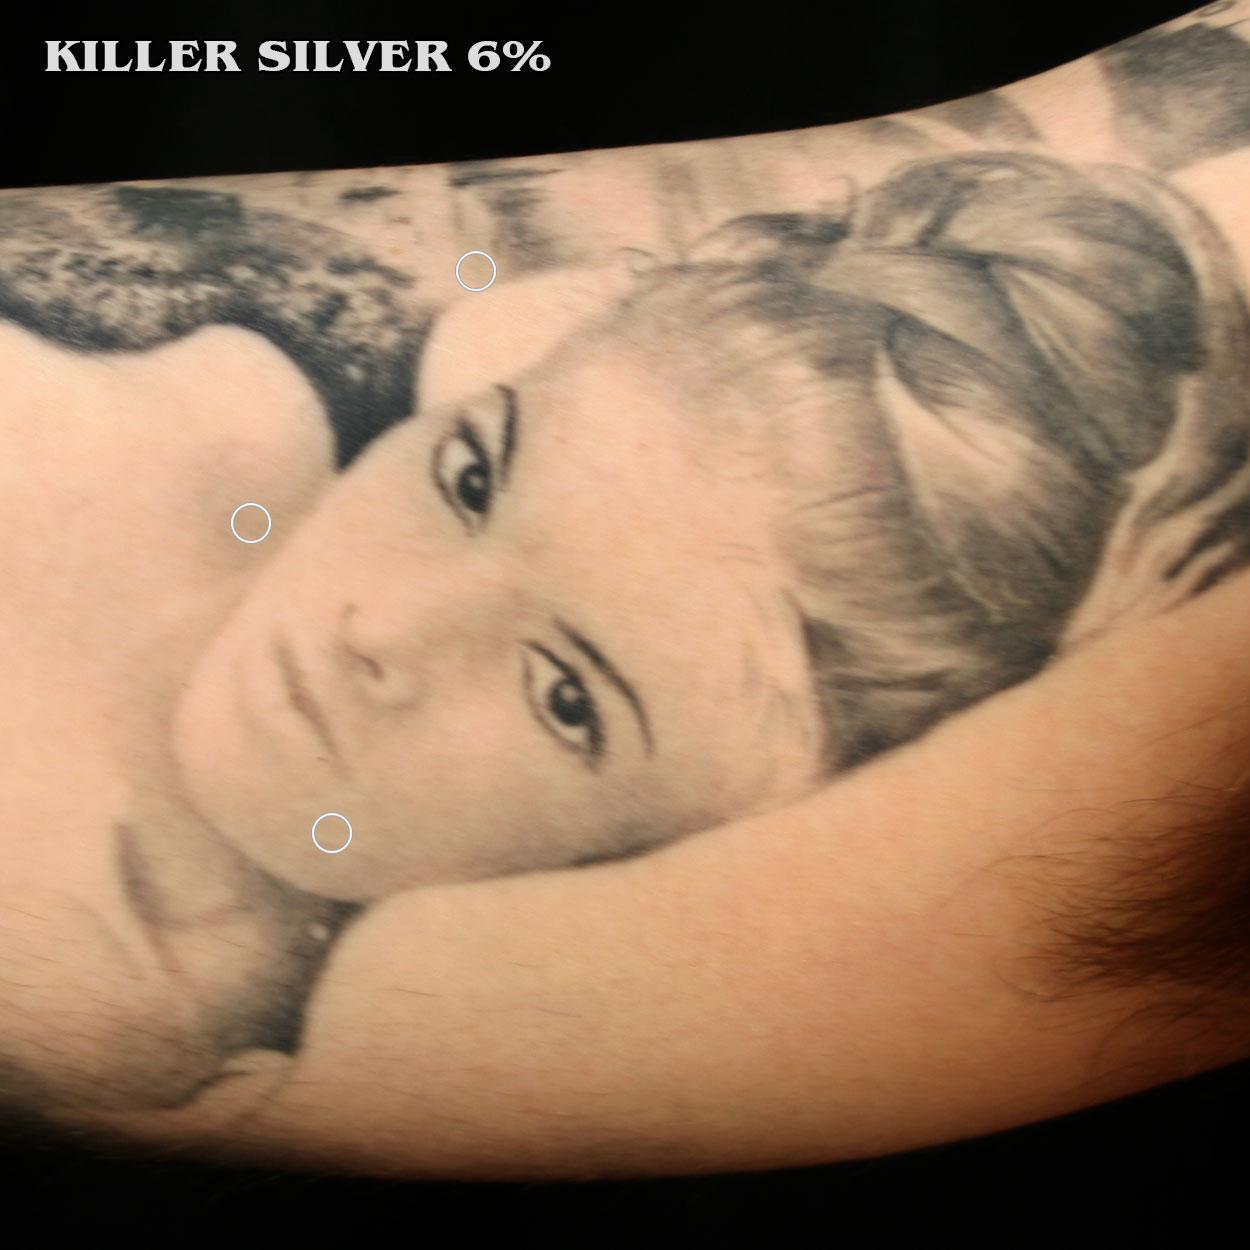 Girl Portrait Tattoo-Killer Silver 6%-Gray-Wash Tattoo Ink-Silver Softness